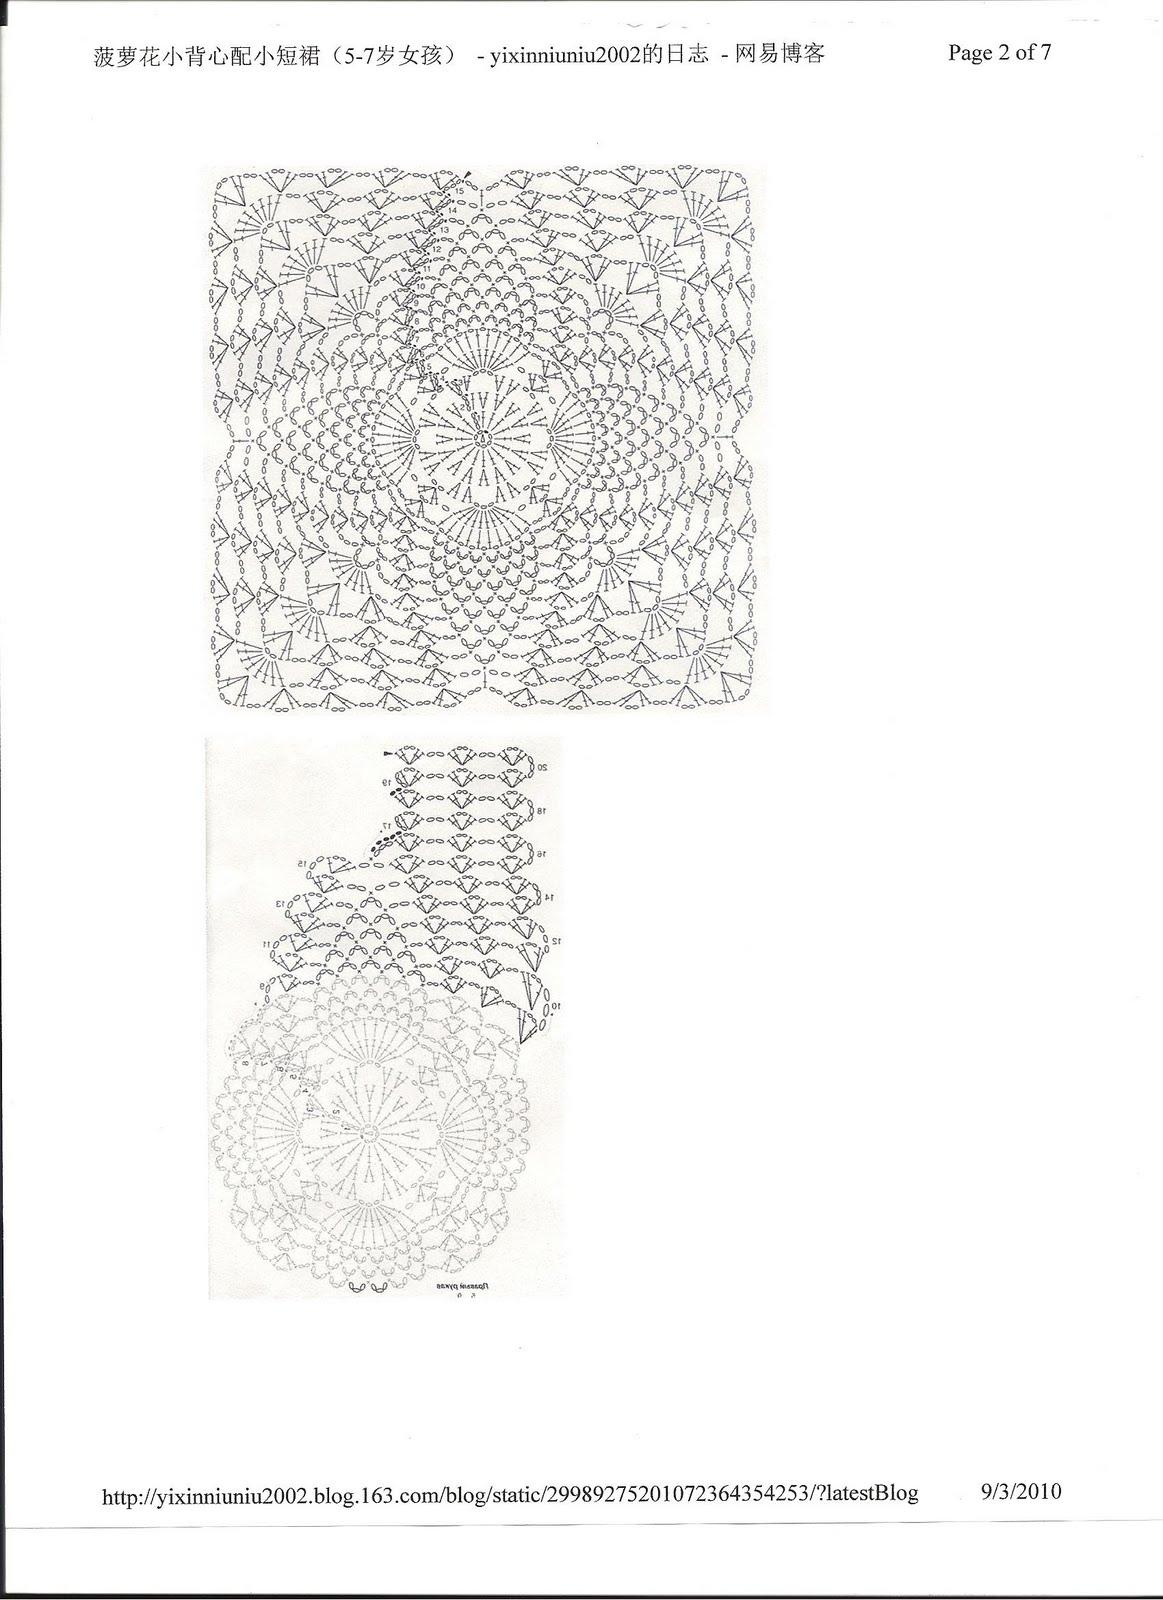 Irma, tejidos y: Chalequito tejido en algodón #3